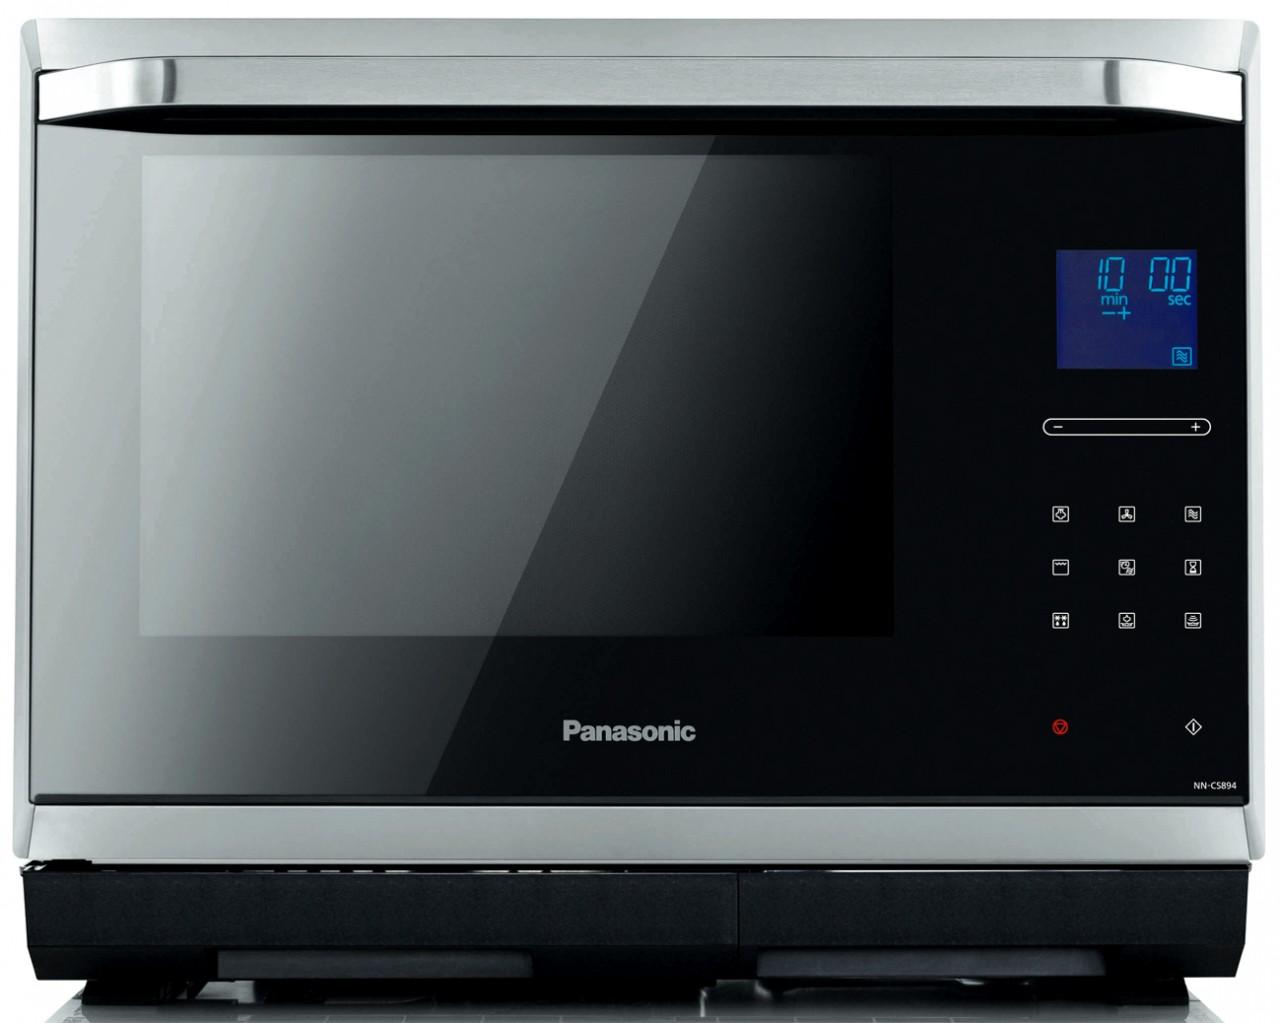 Panasonic_Dampfgar-Mikrowelle_NN-CS894